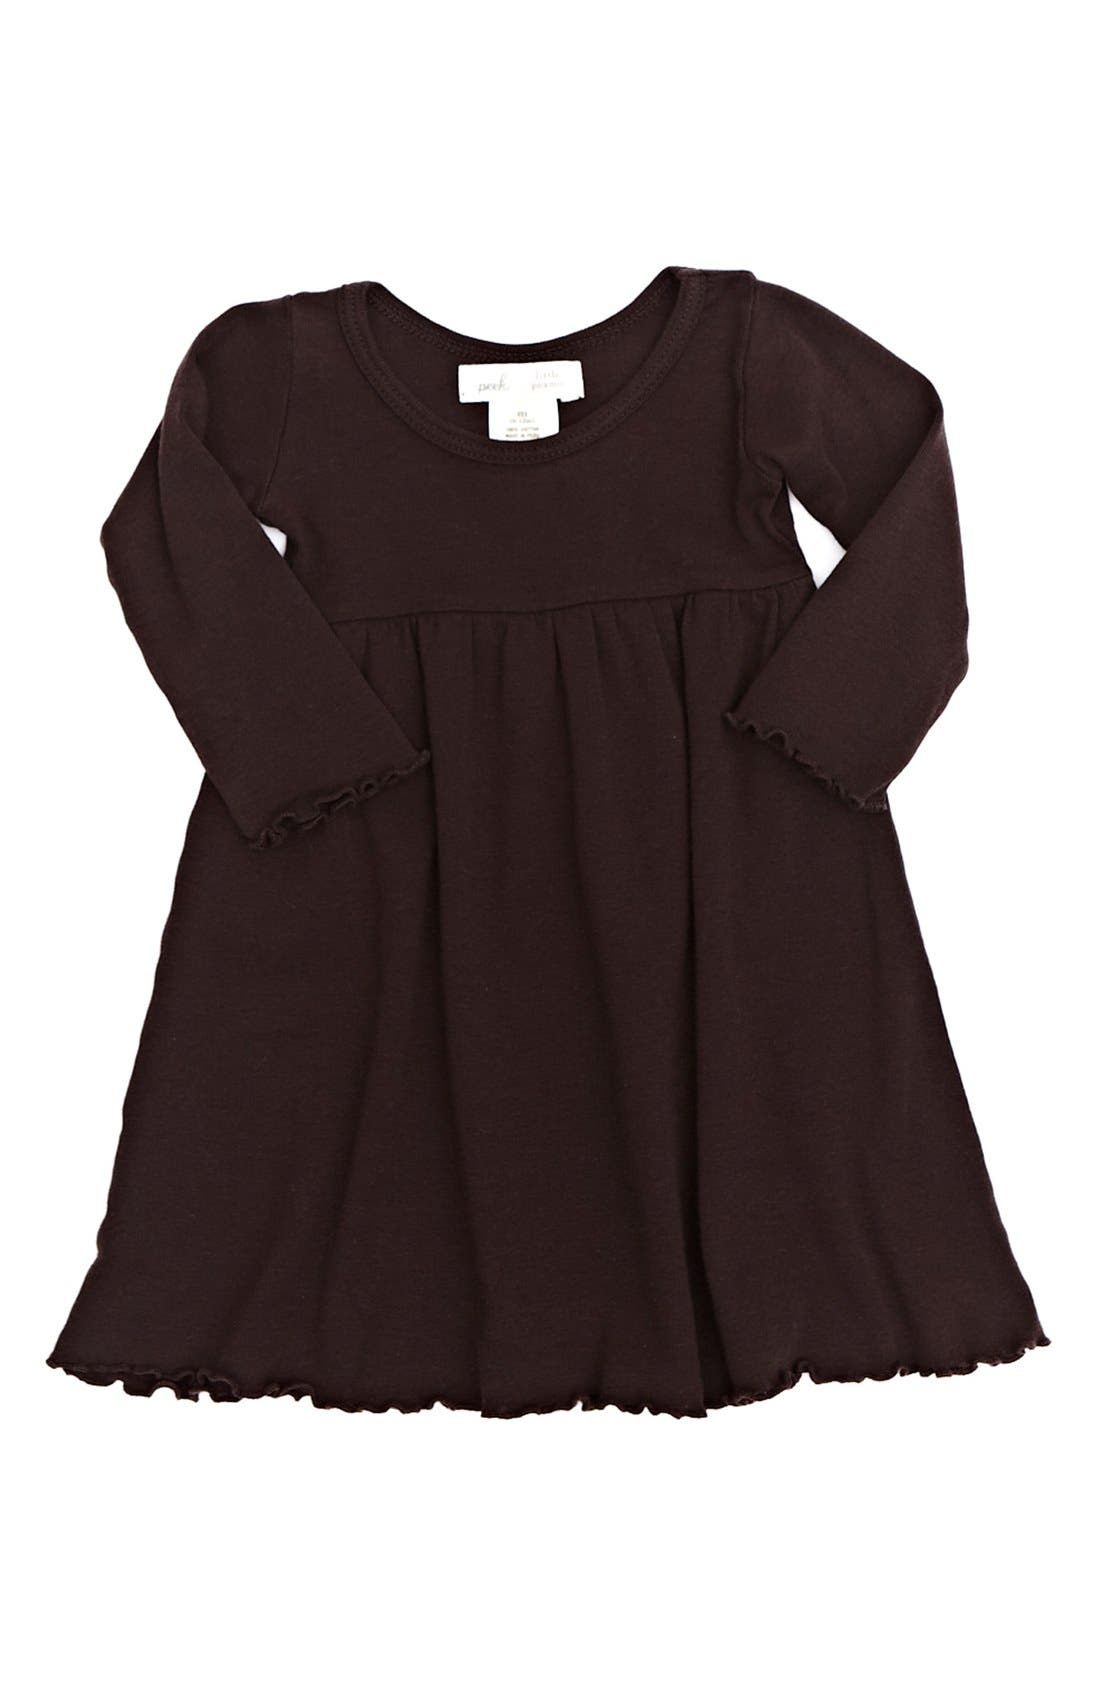 Main Image - Peek 'Little Peanut' Dress (Baby Girls)